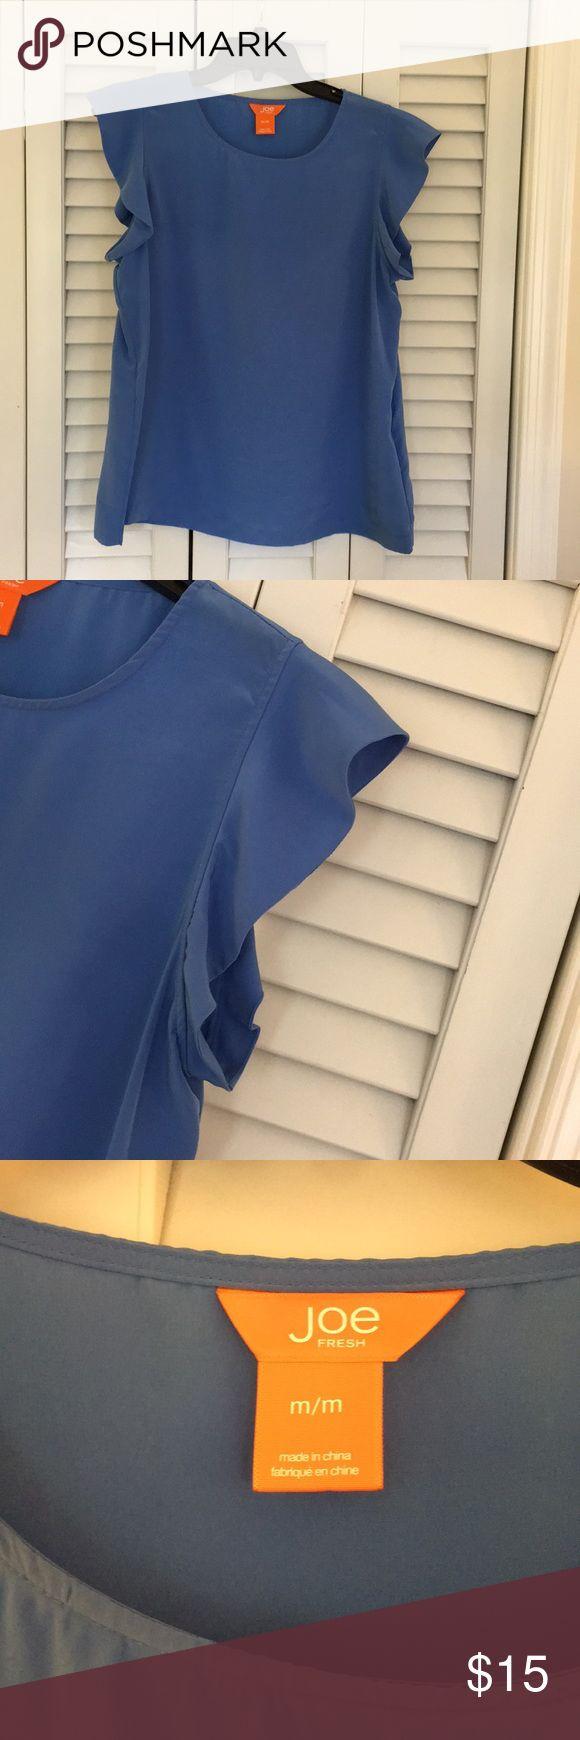 Joe Fresh periwinkle blue ruffle sleeve top Joe Fresh top; periwinkle blue; ruffle sleeve detail. Great basic that can be dressed up or down! Joe Fresh Tops Blouses